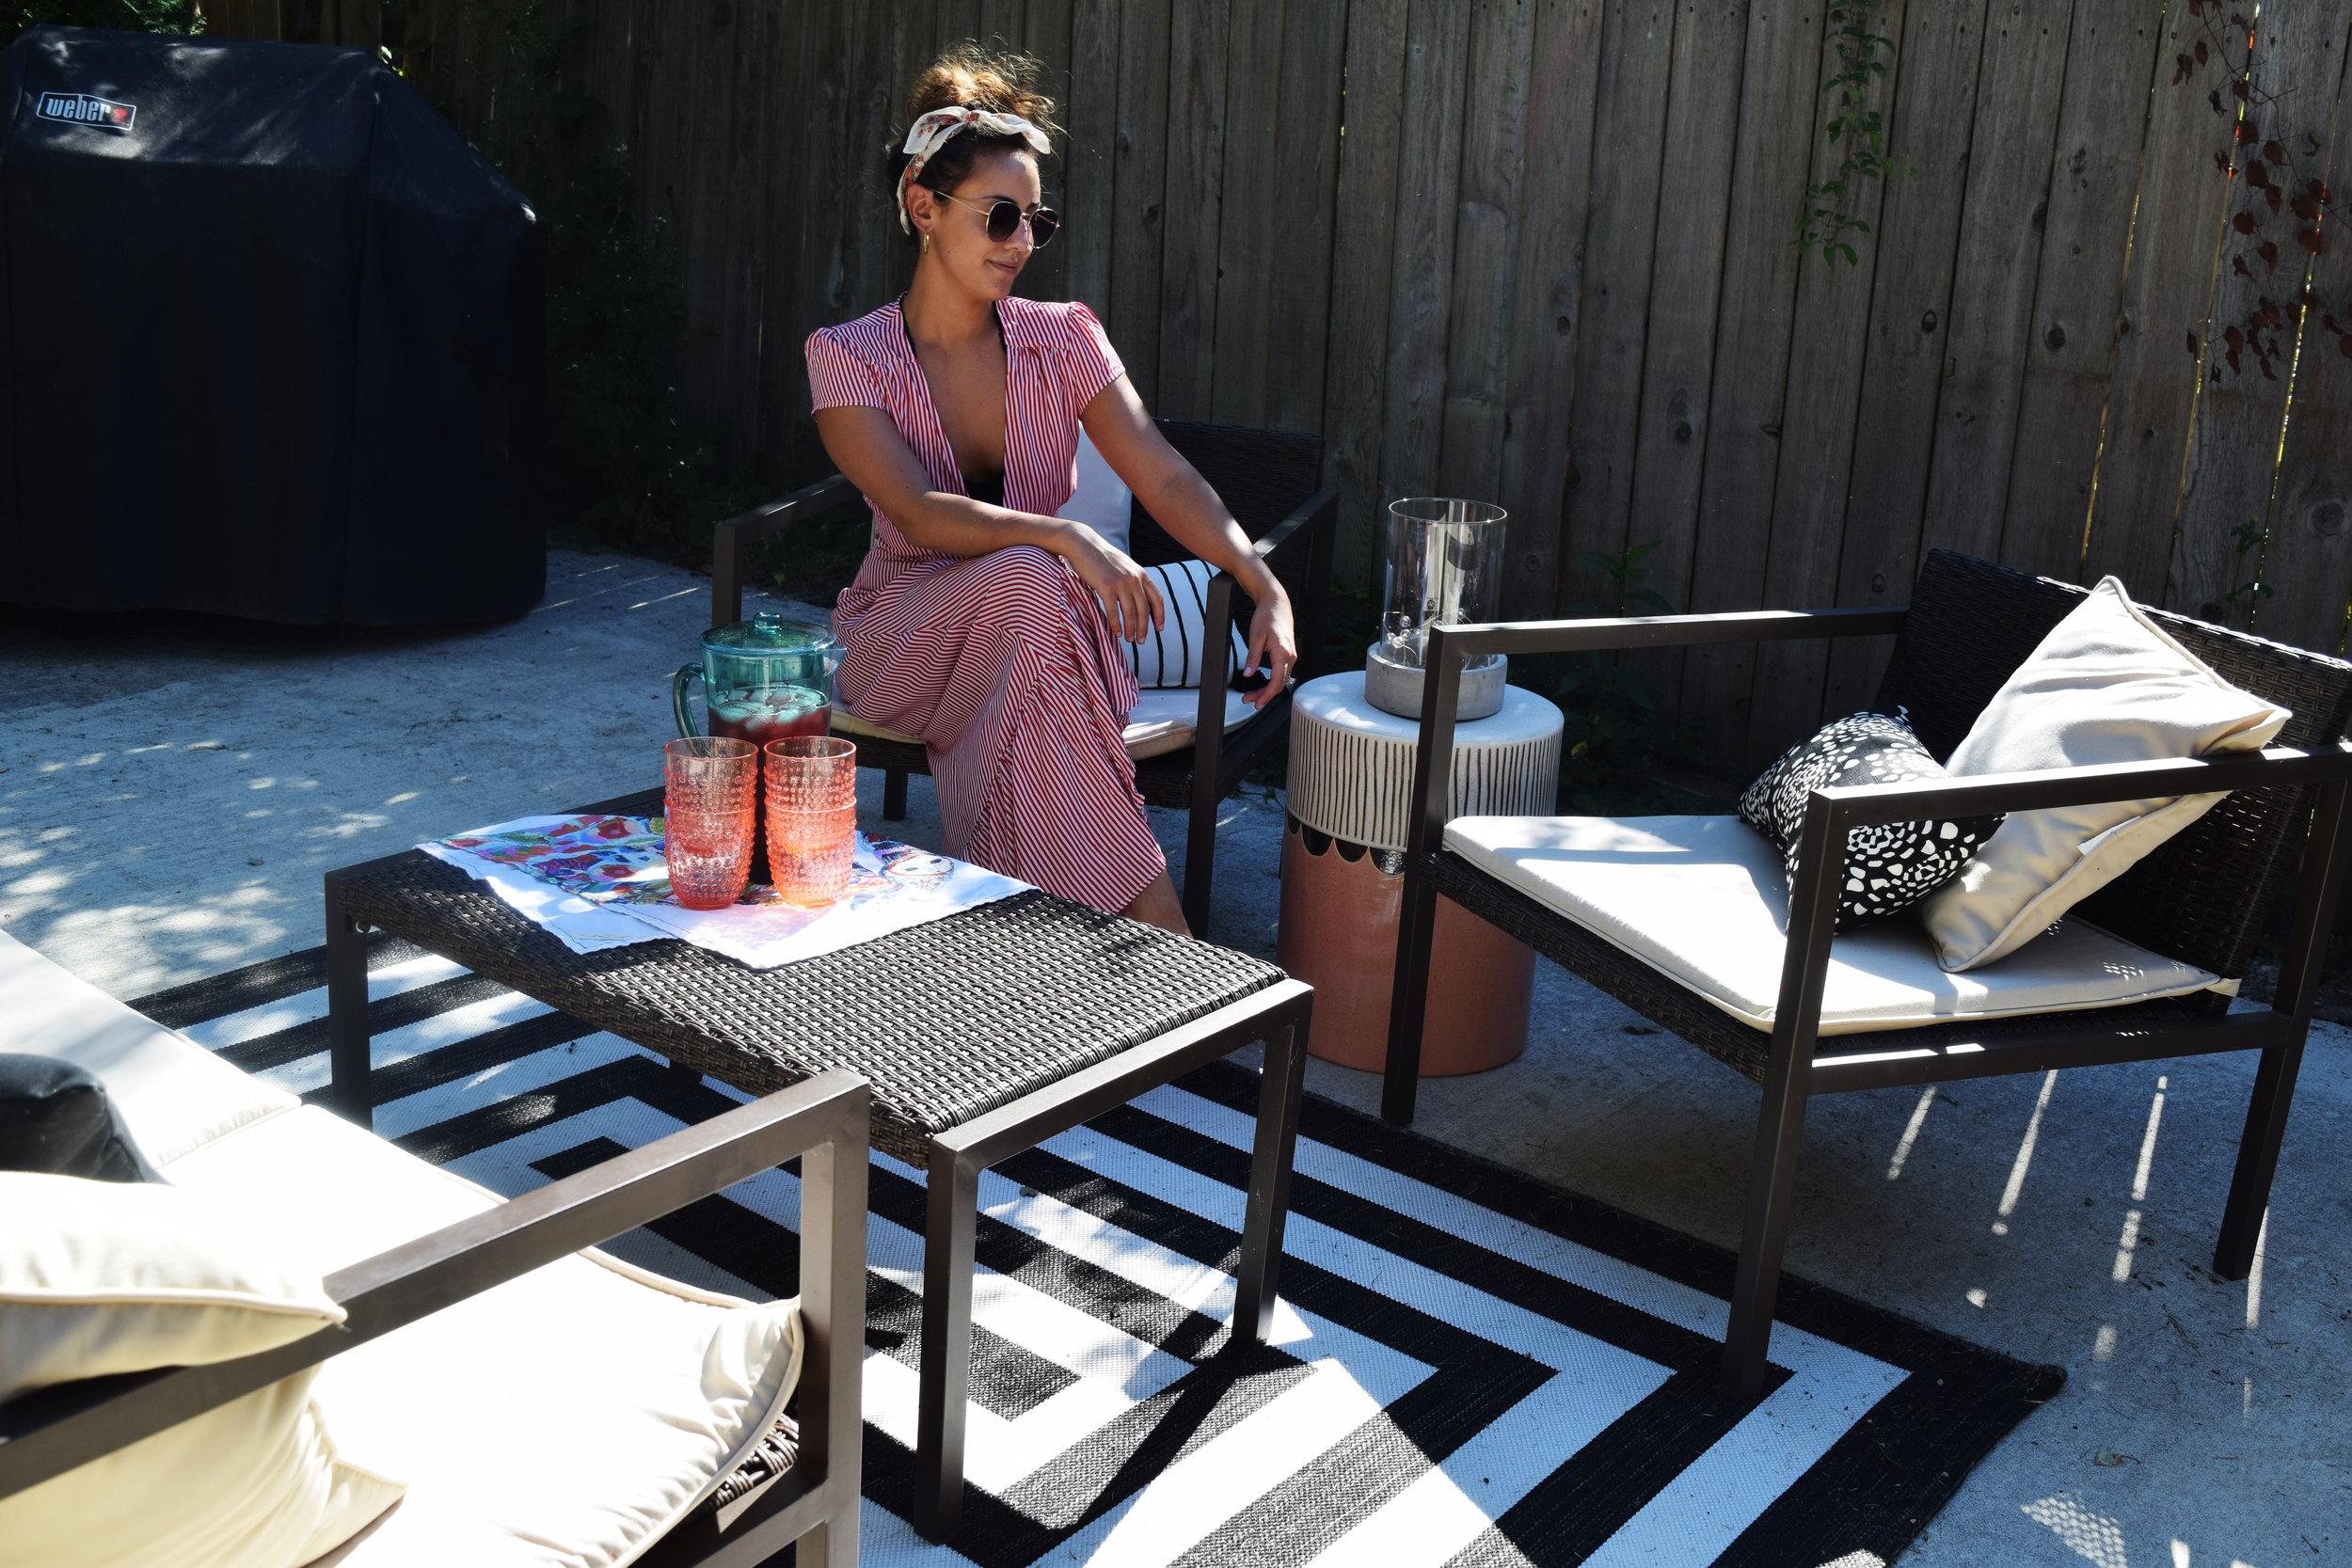 backyard outfit 2.jpg